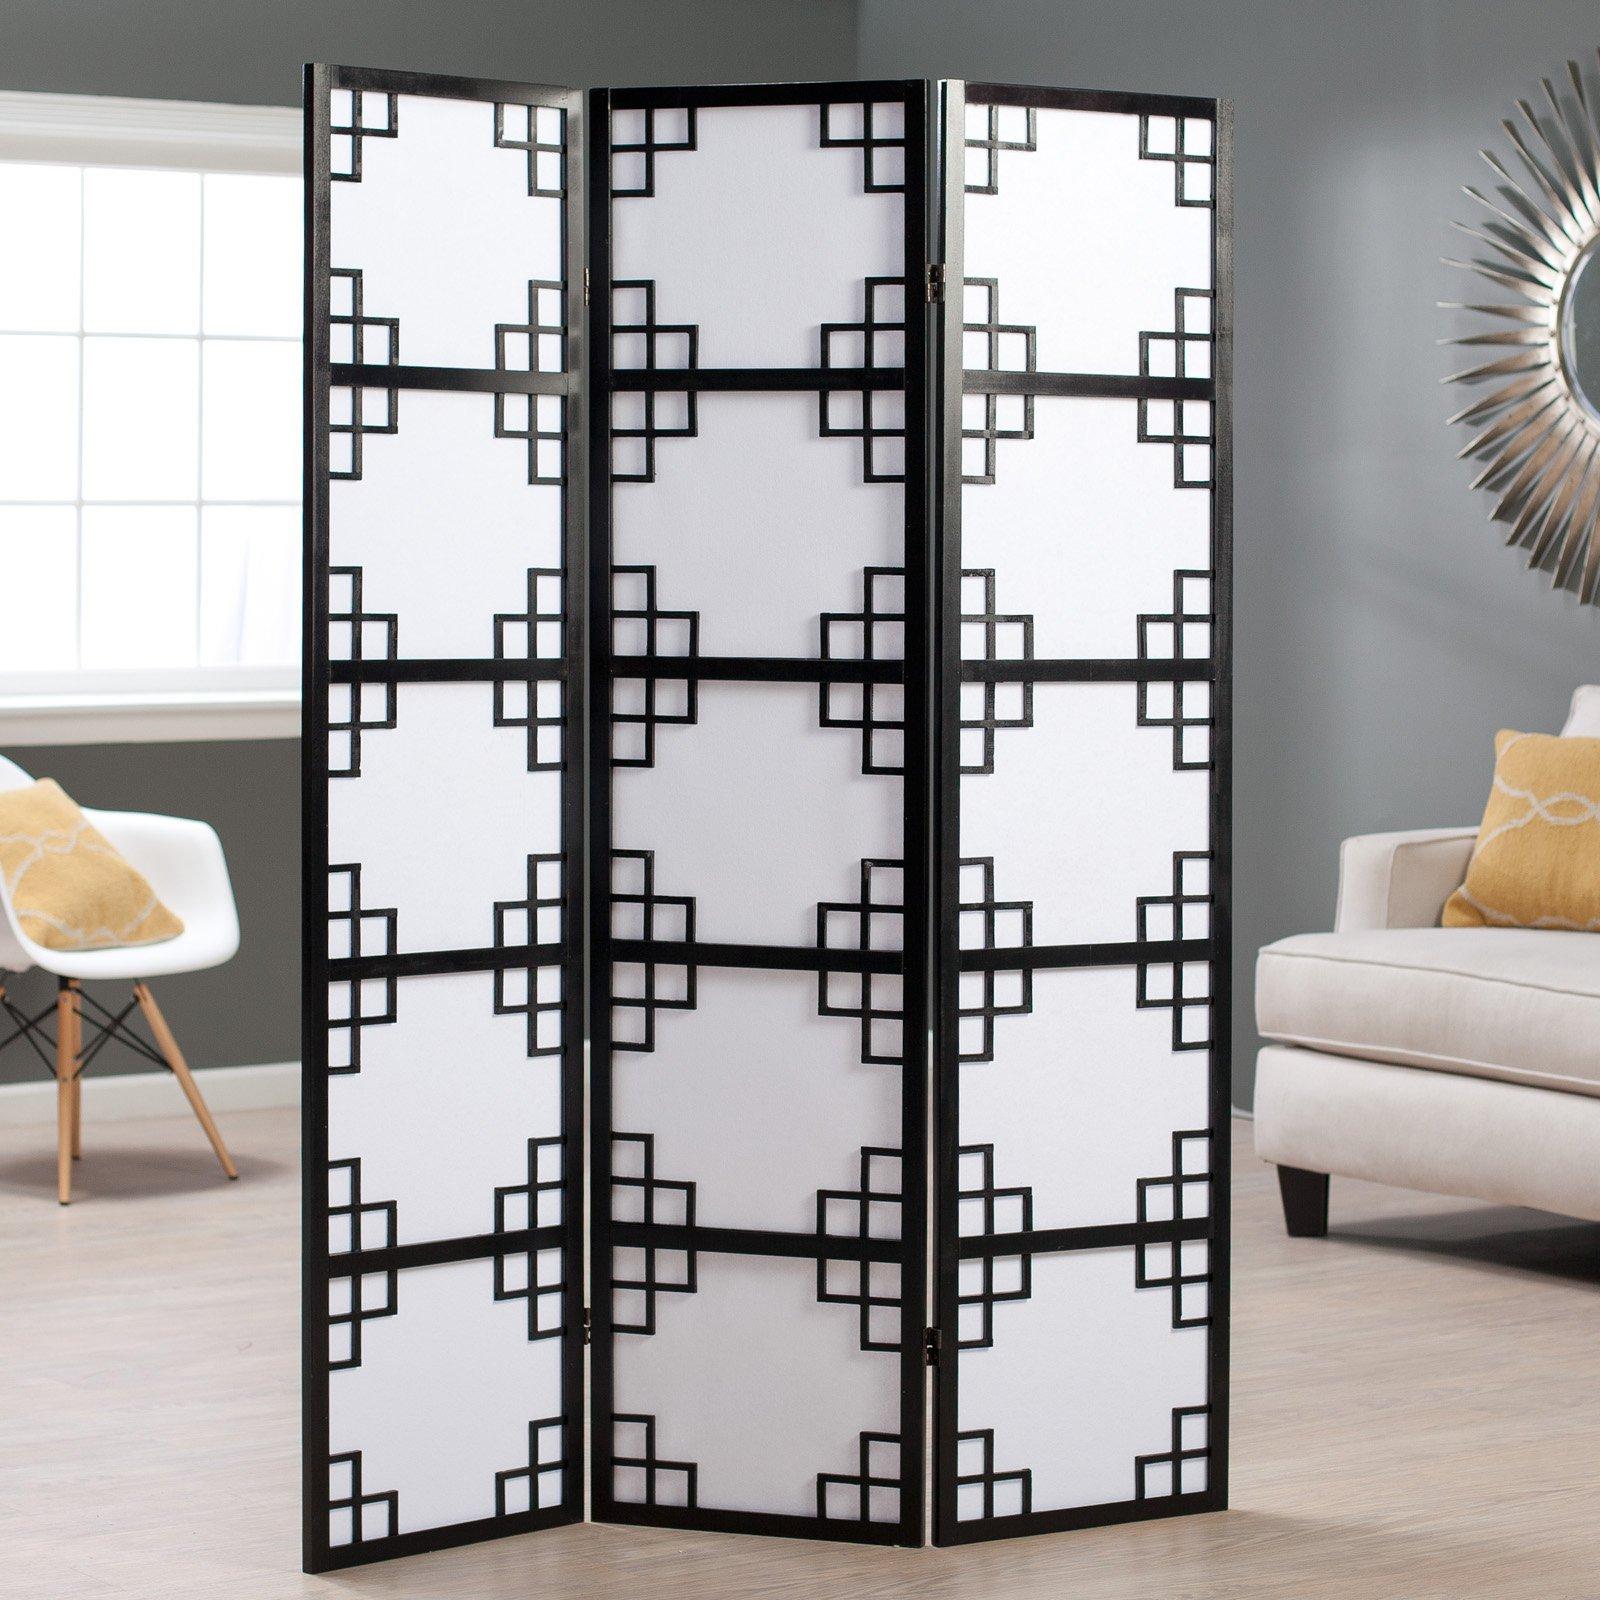 Black Omei Lattice 3-Panel Screen Room Divider